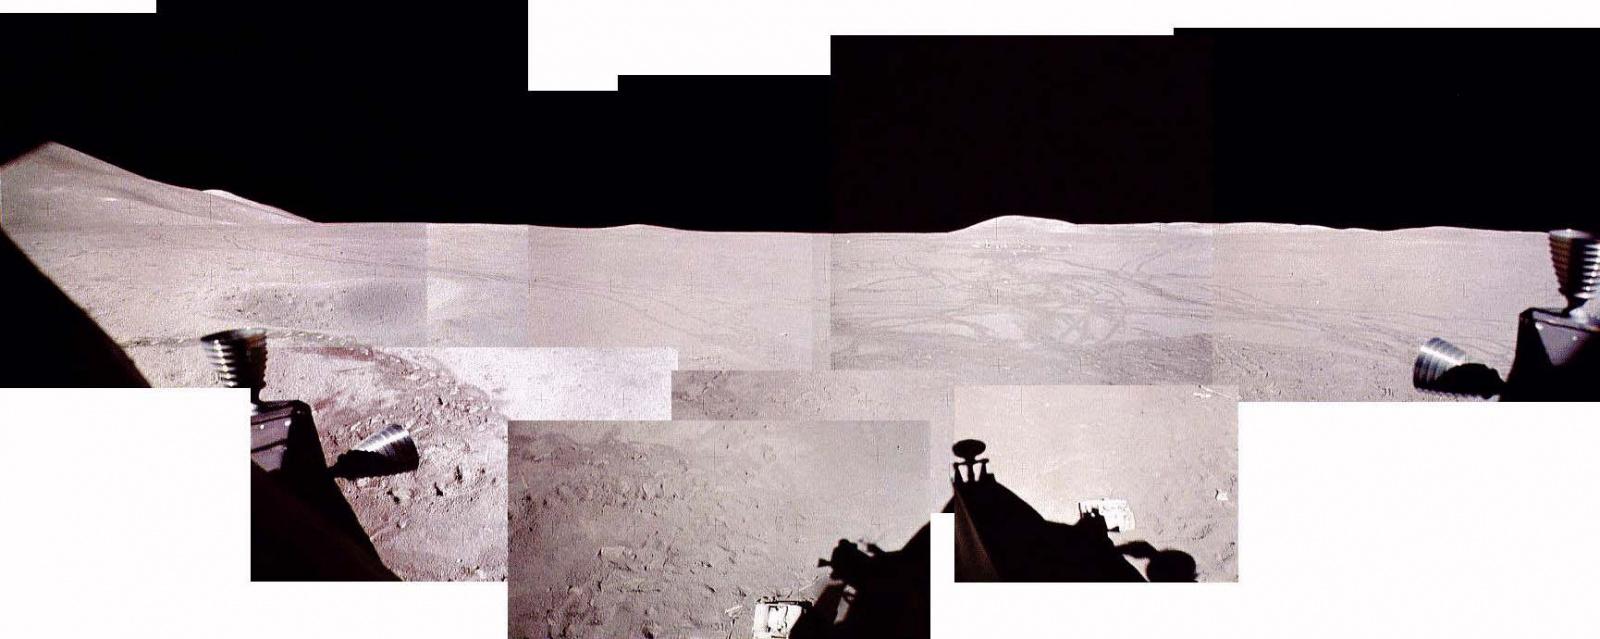 Apollo_15_Composite_window_pan.jpg